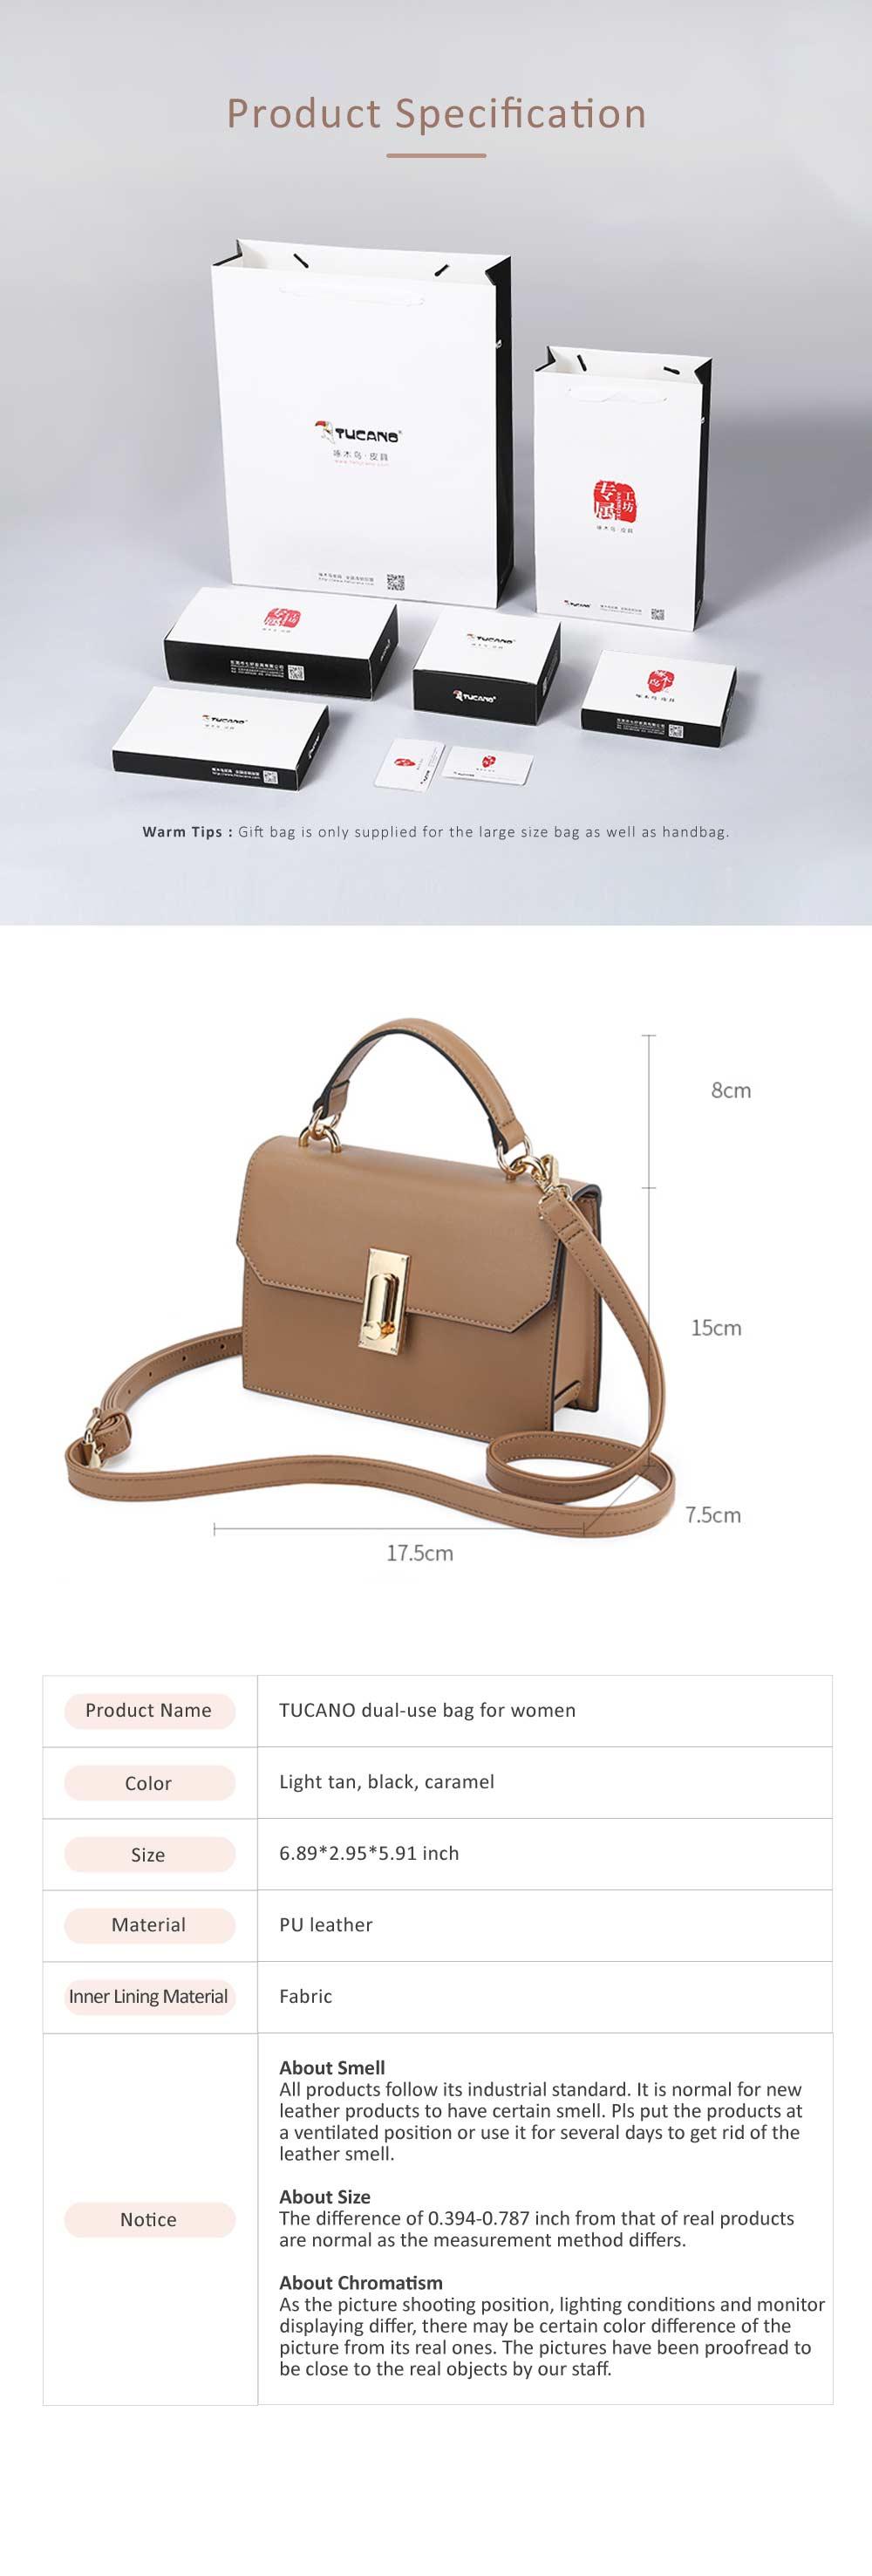 TUCANO New Style Handbag for Women, Fashionable Square Messenger Bag for Women Single-shoulder Bag 10